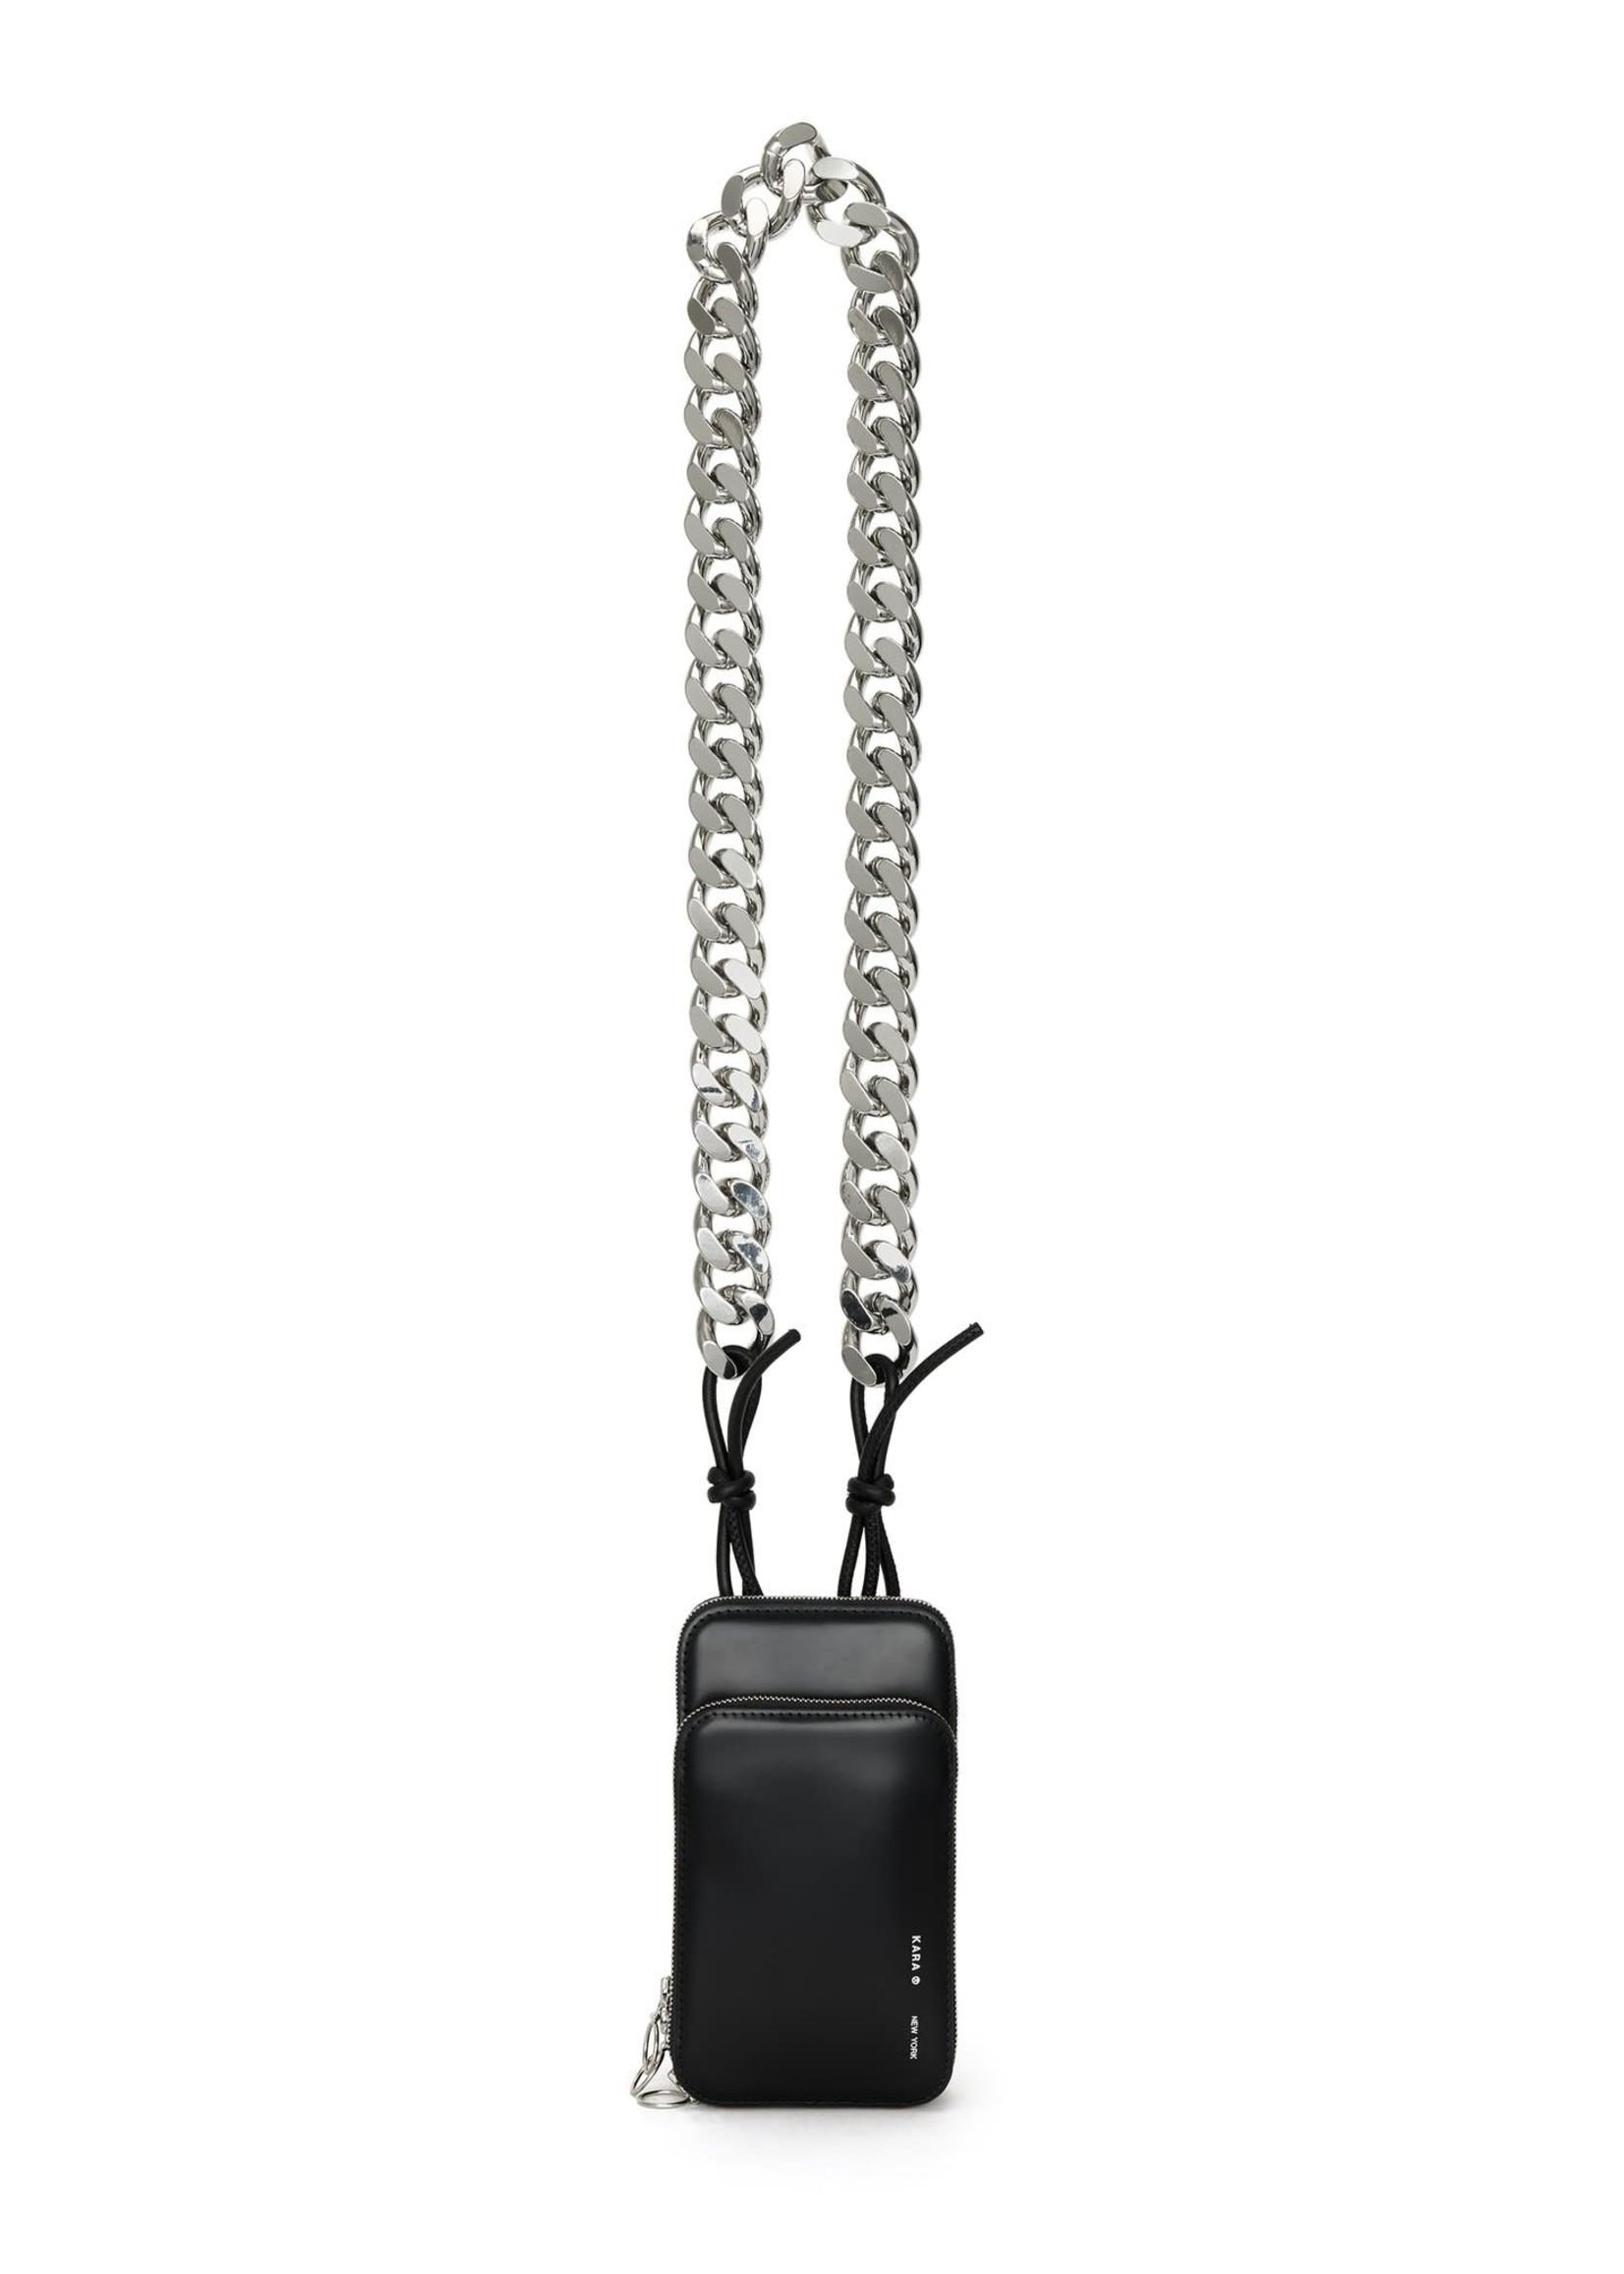 KARA Duplex Phone Bag with chain in Black